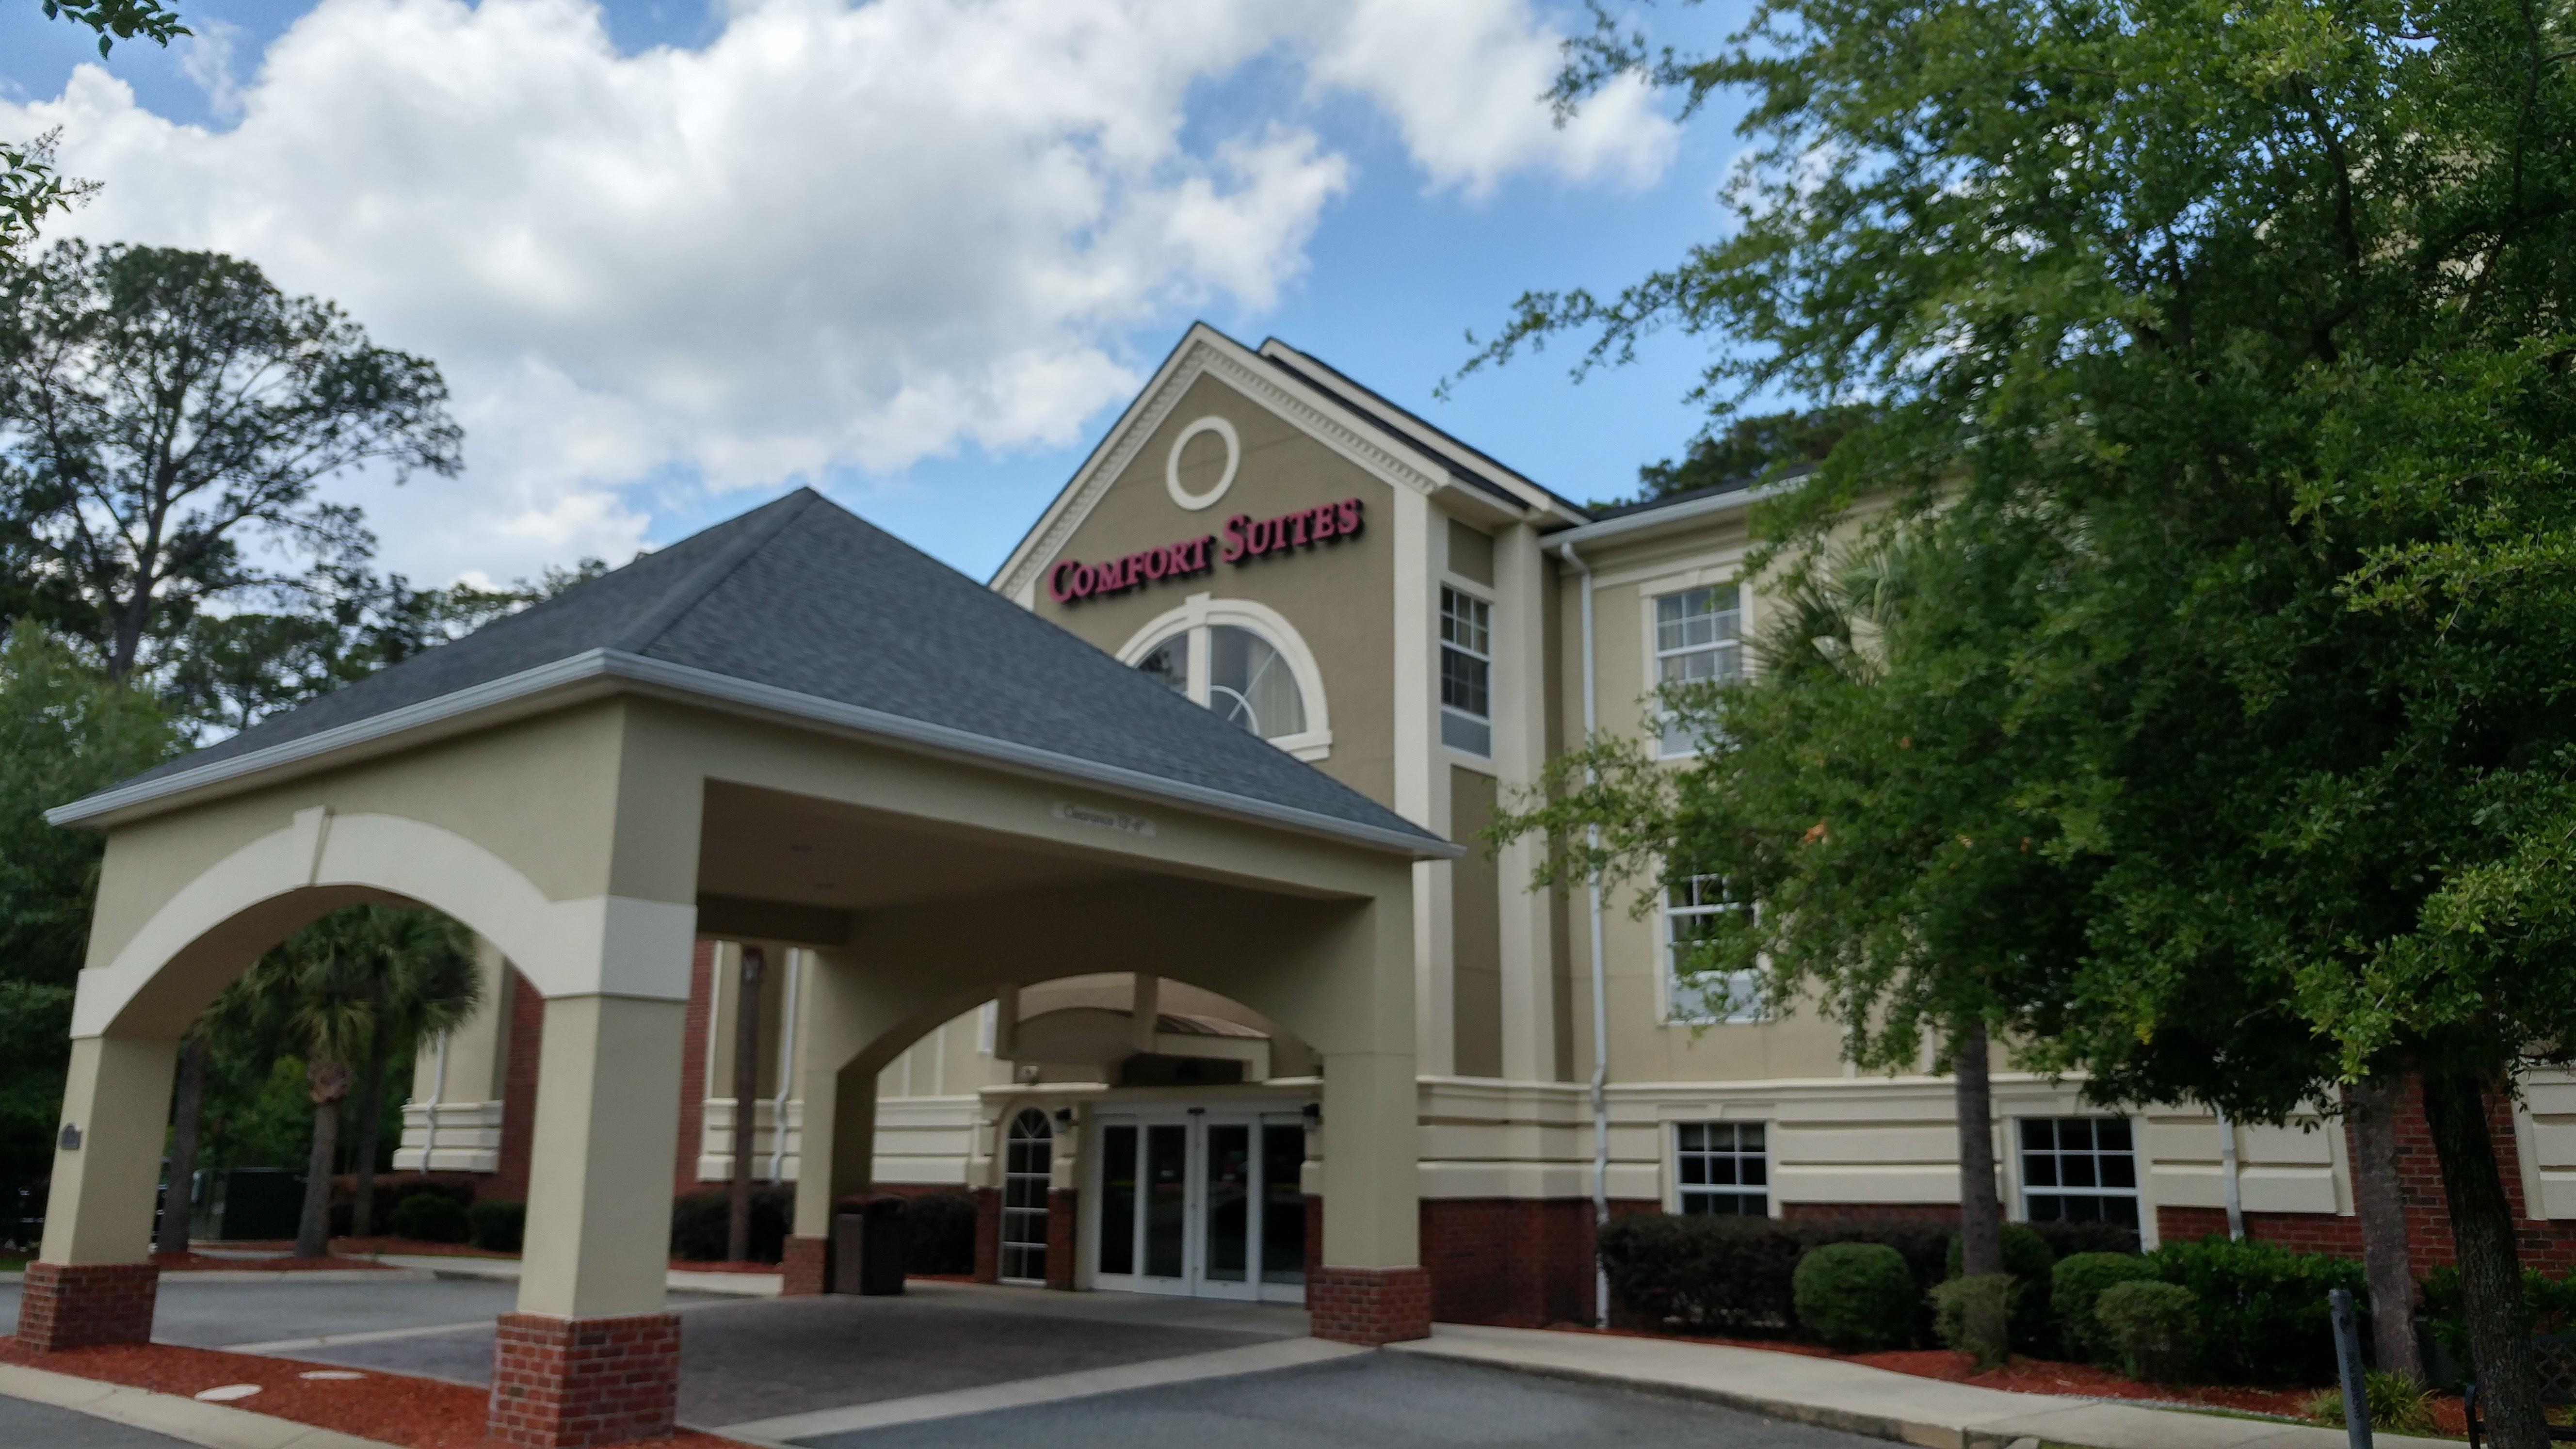 Comfort Suites 23 Towne Dr, Bluffton, SC 29910